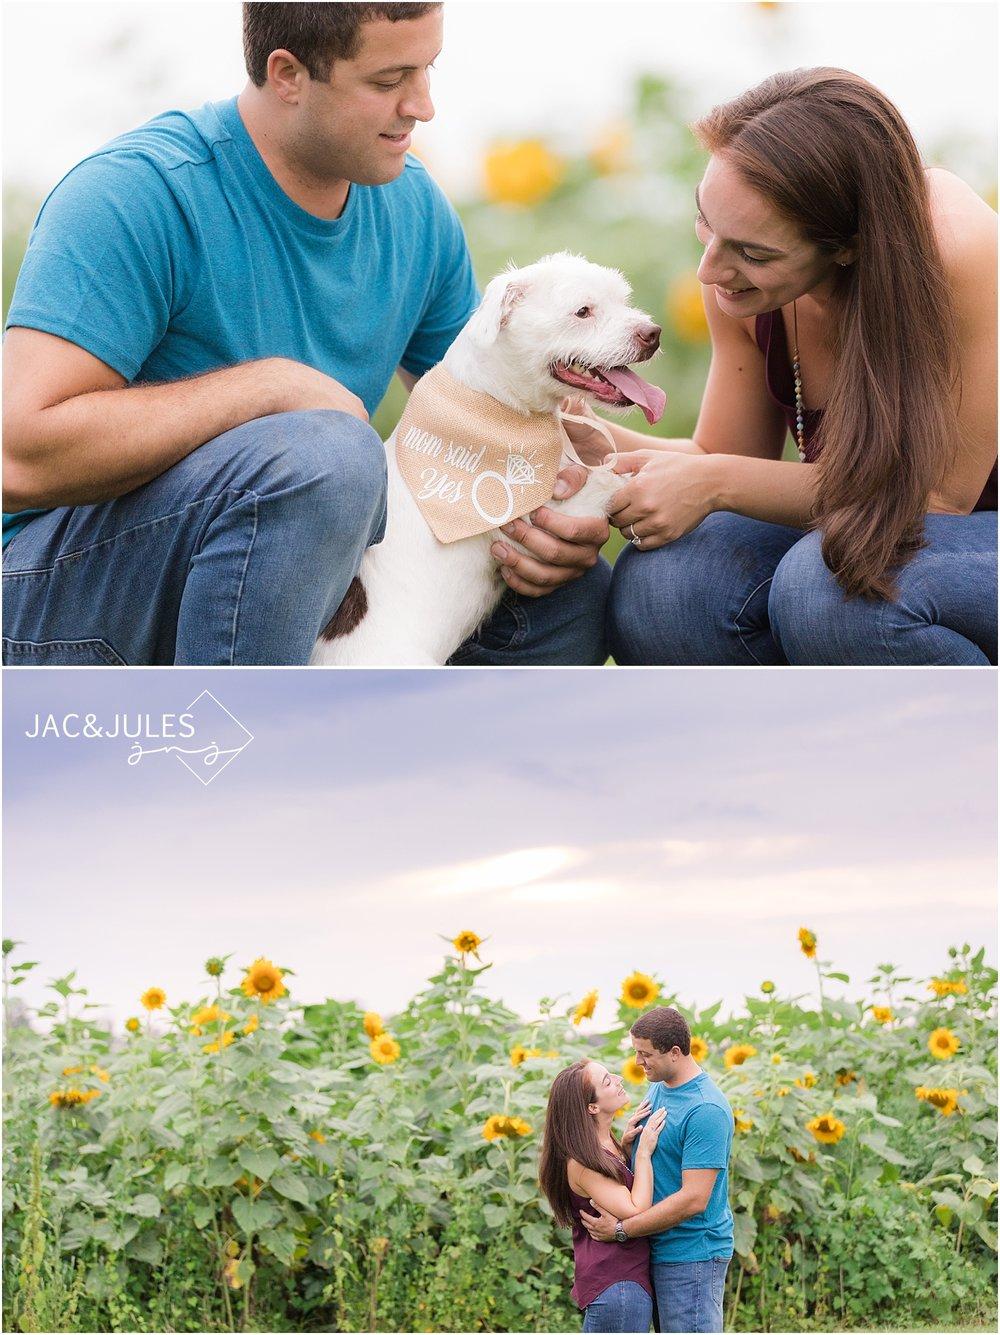 romantic engagement photos at johnsons locust hall farm in nj